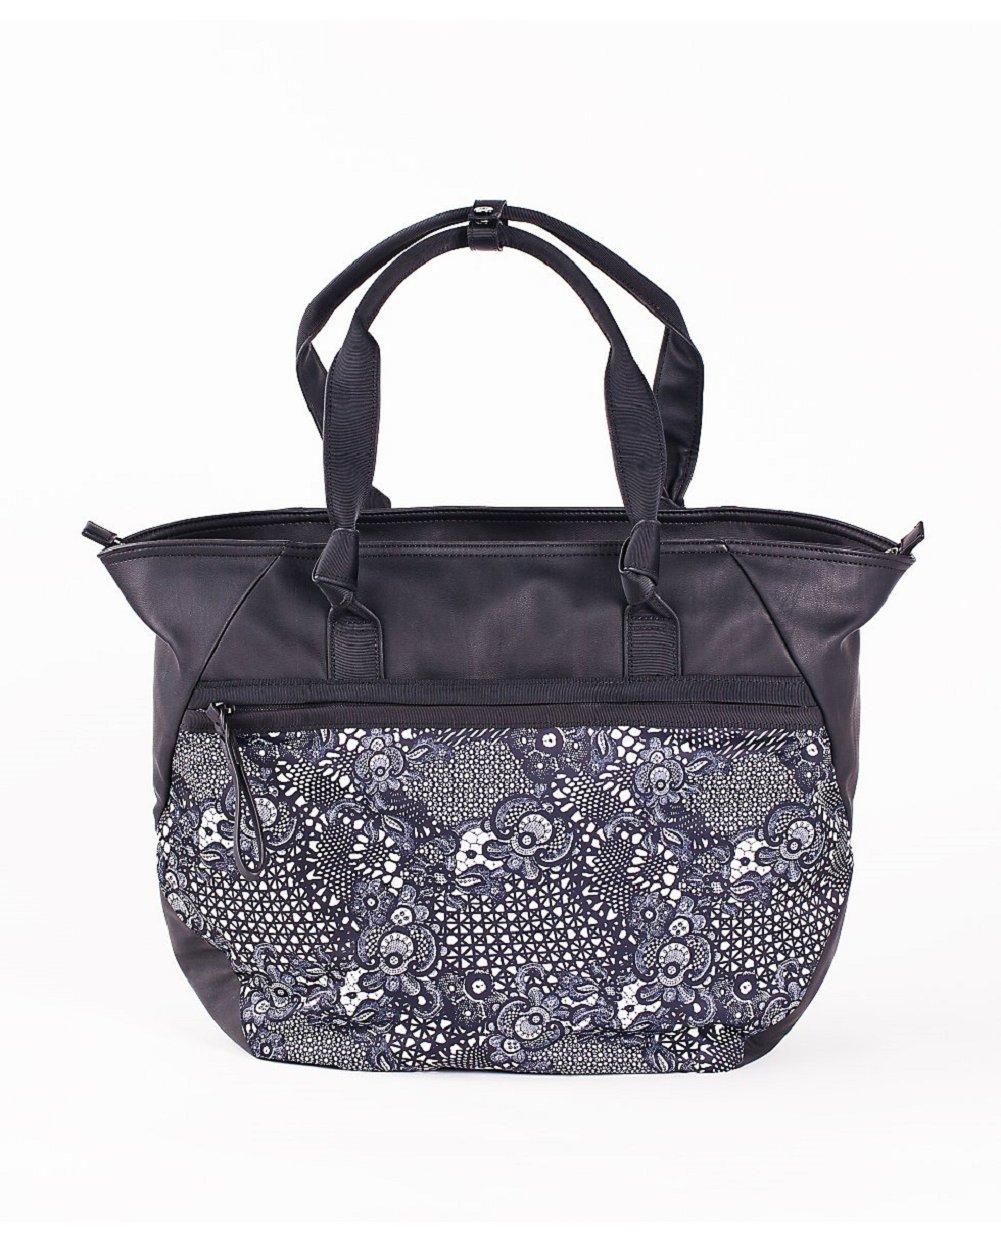 LULULEMON EVERYTHING BAG - Pretty Lace White Black - O/S